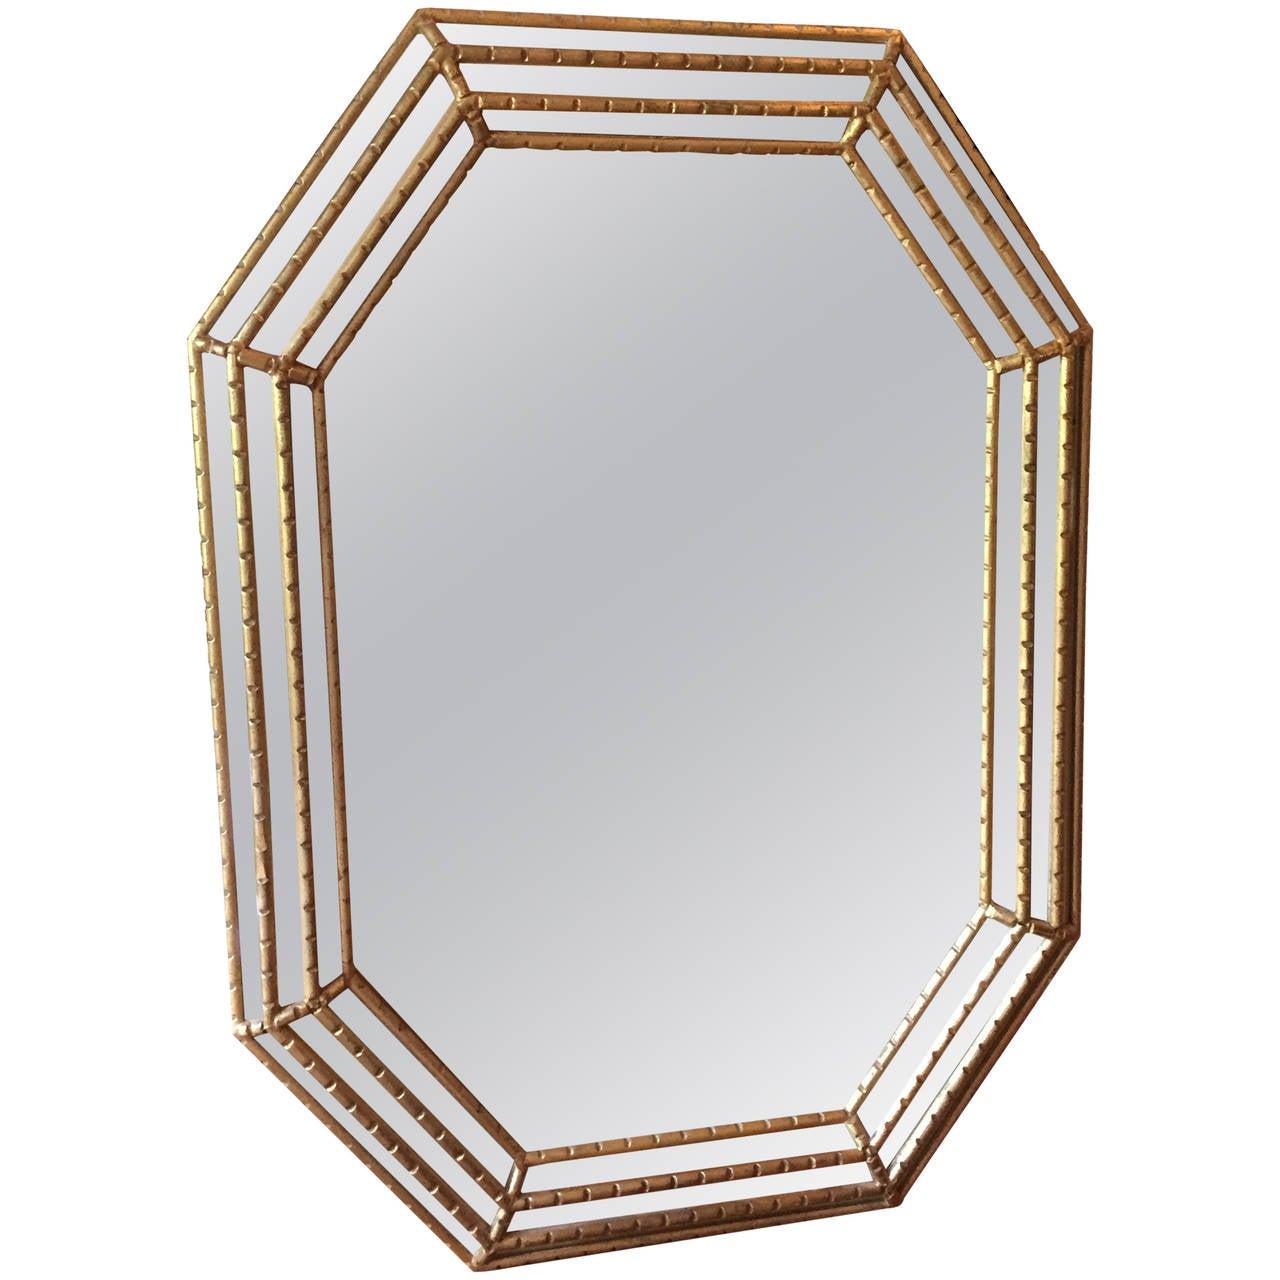 La Barge Giltwood Faux Bamboo Mirror